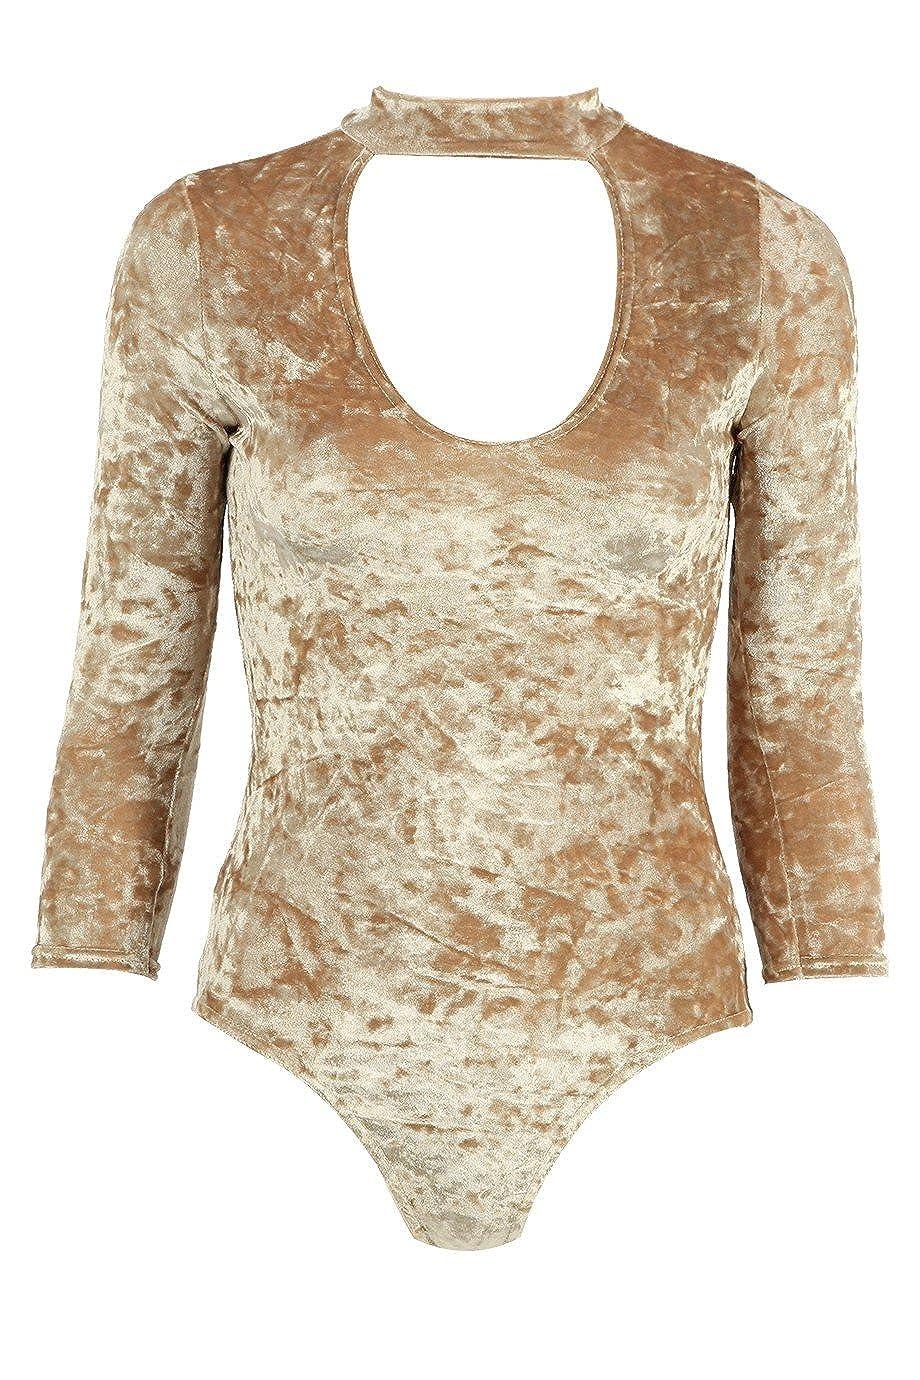 Momo& Ayat Fashions Damen Crushed Velvet Choker Bodysuit EUR Größe 36-42